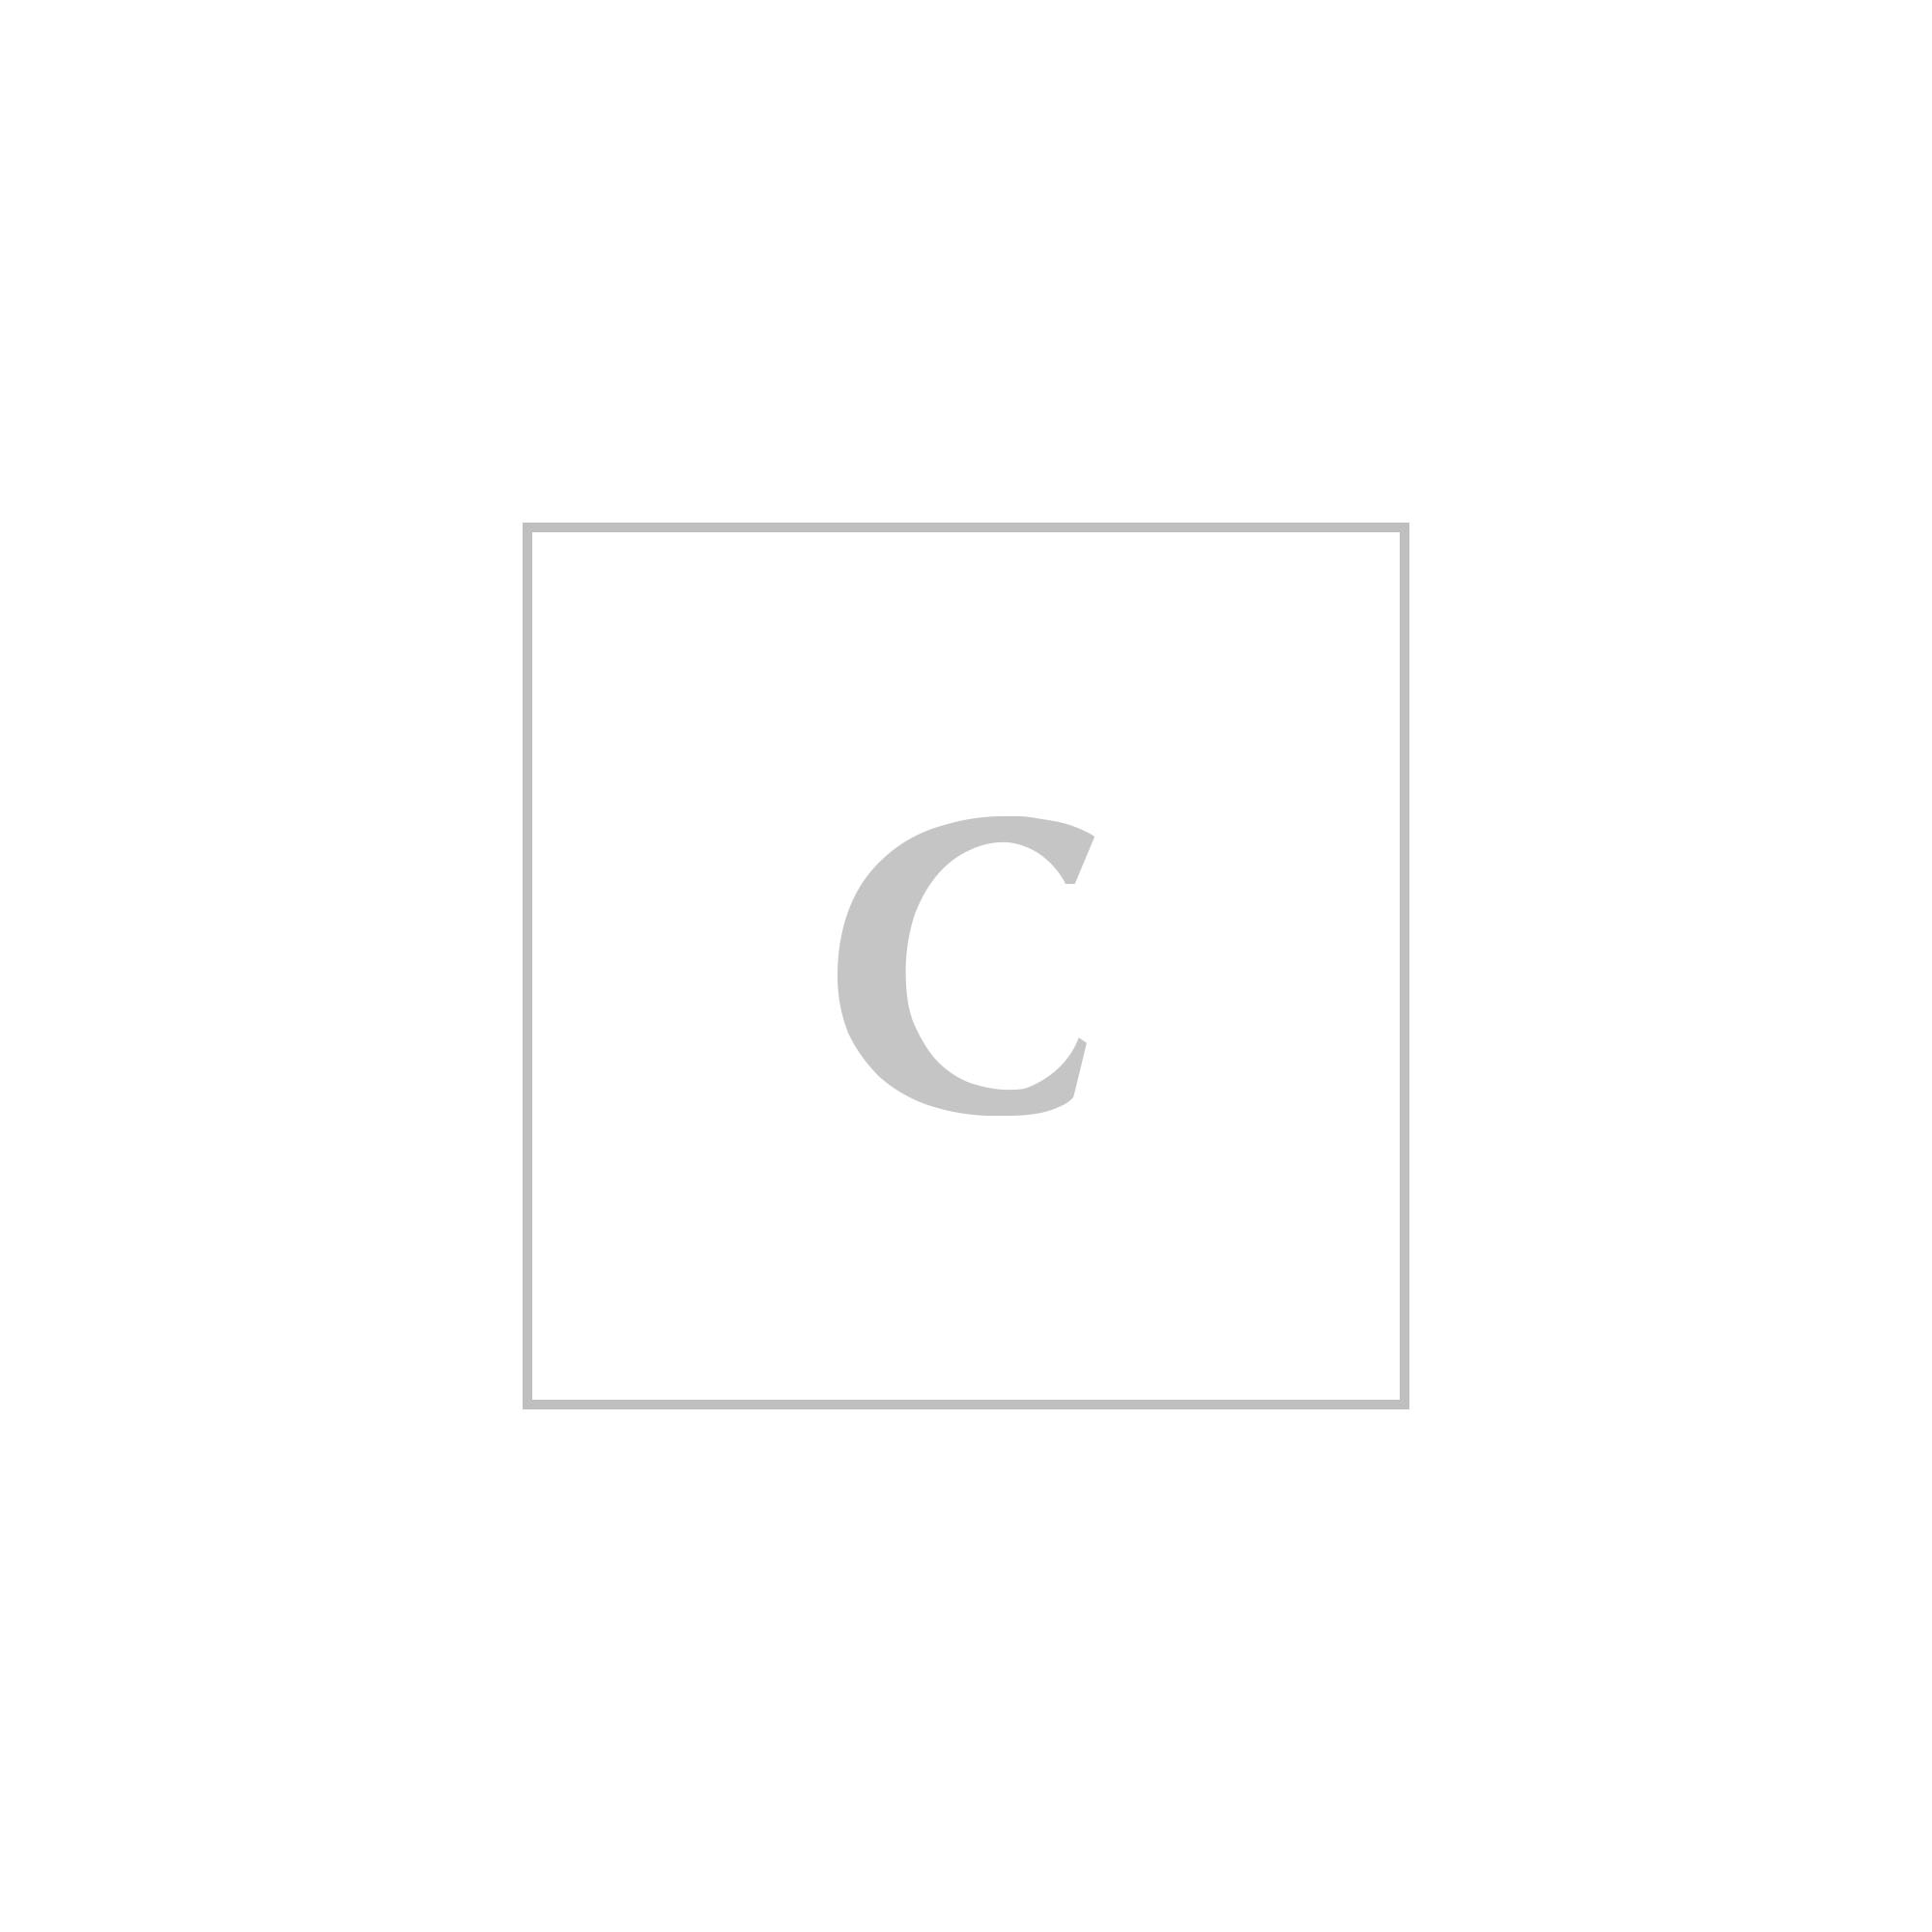 Saint laurent ysl mini borsa monogram